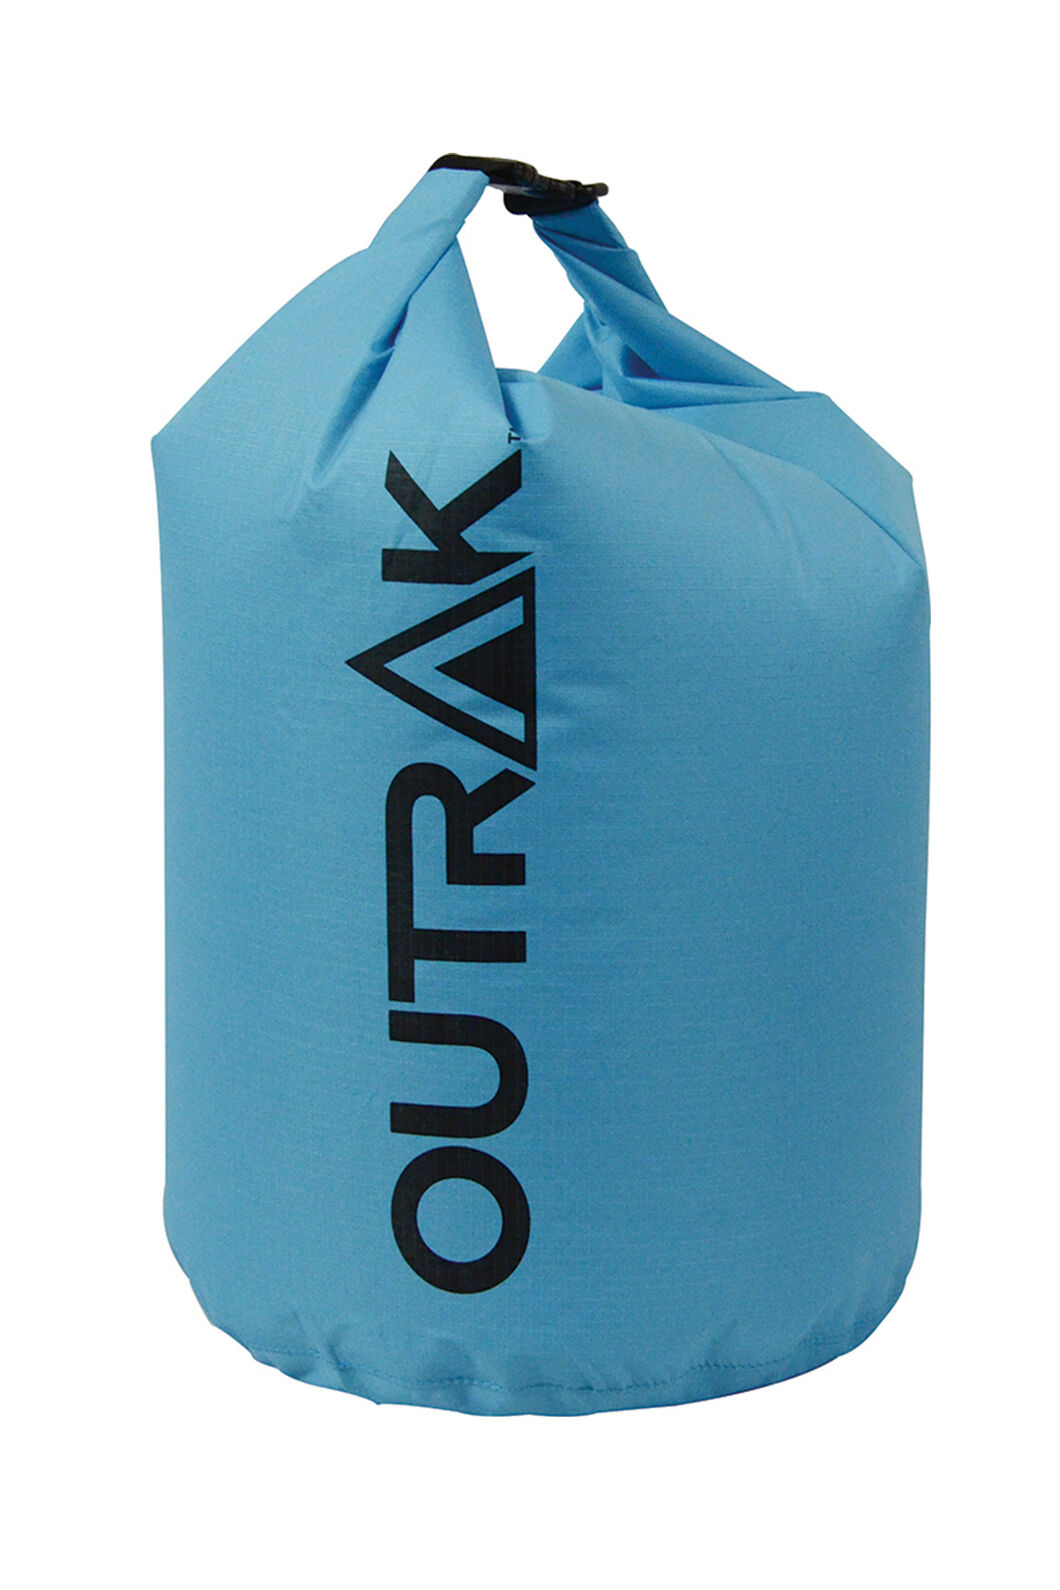 Outrak Lightweight 10L Dry Bag, None, hi-res